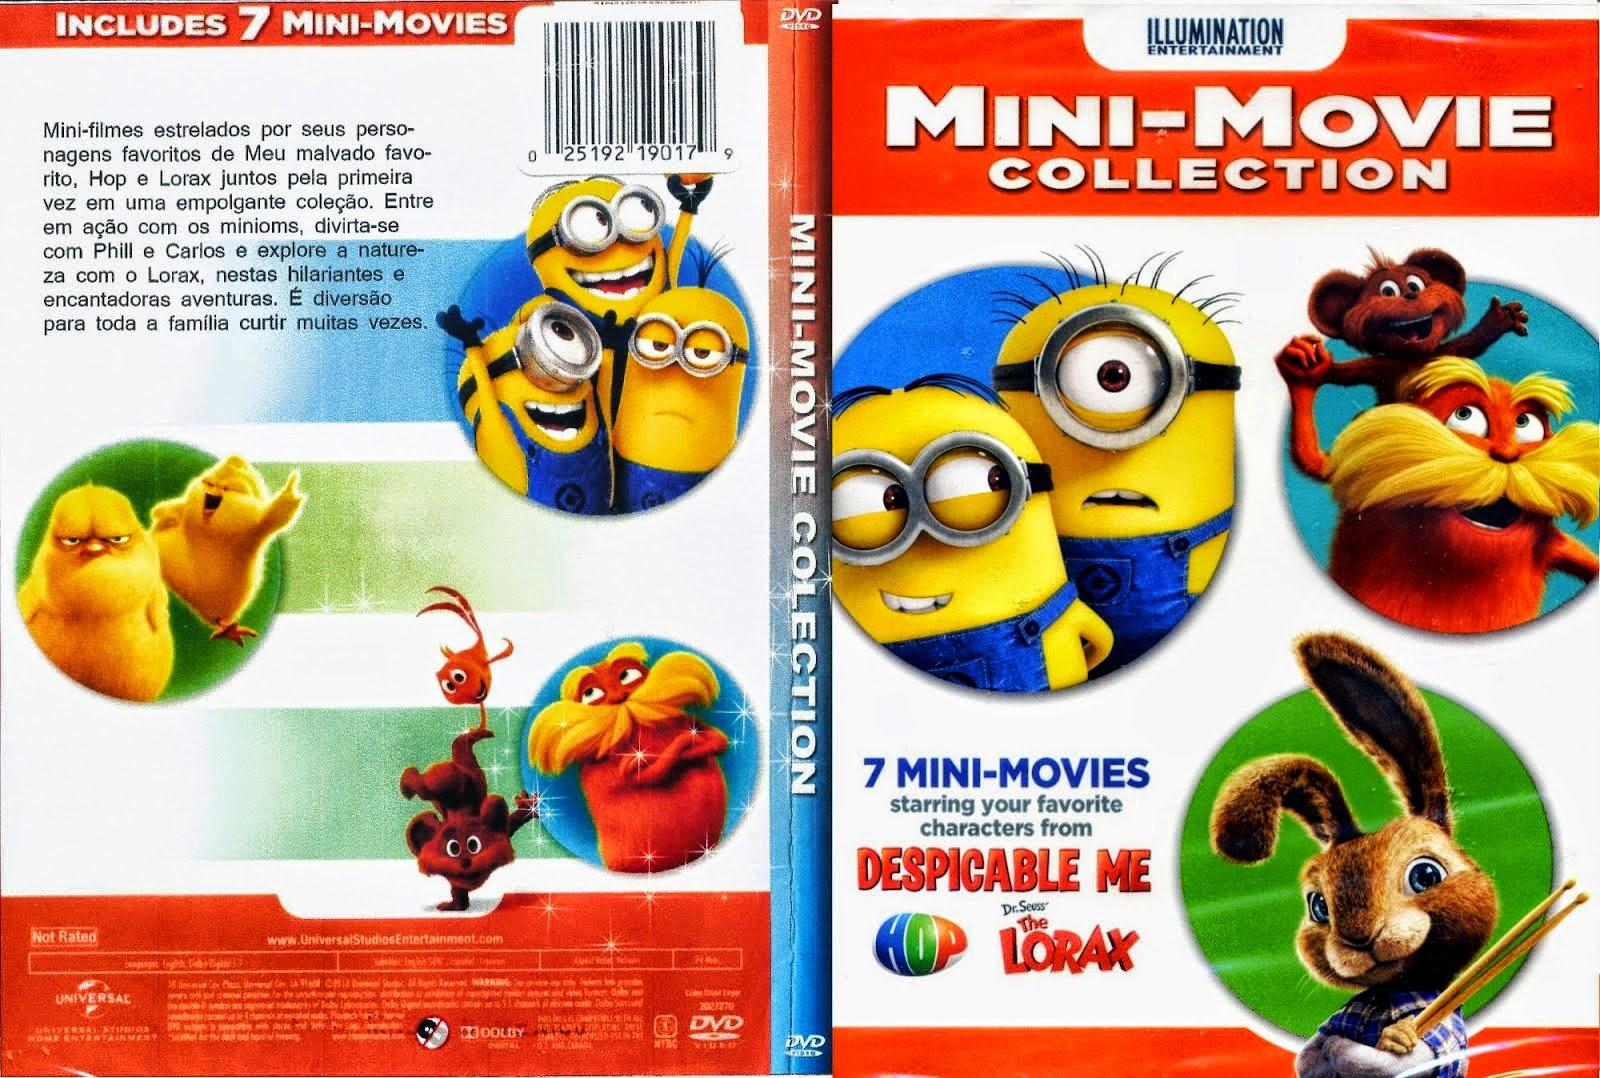 Download Mini Movie Collection DVD-R MINI MOVIE COLLECTION XANDAODOWNLOAD